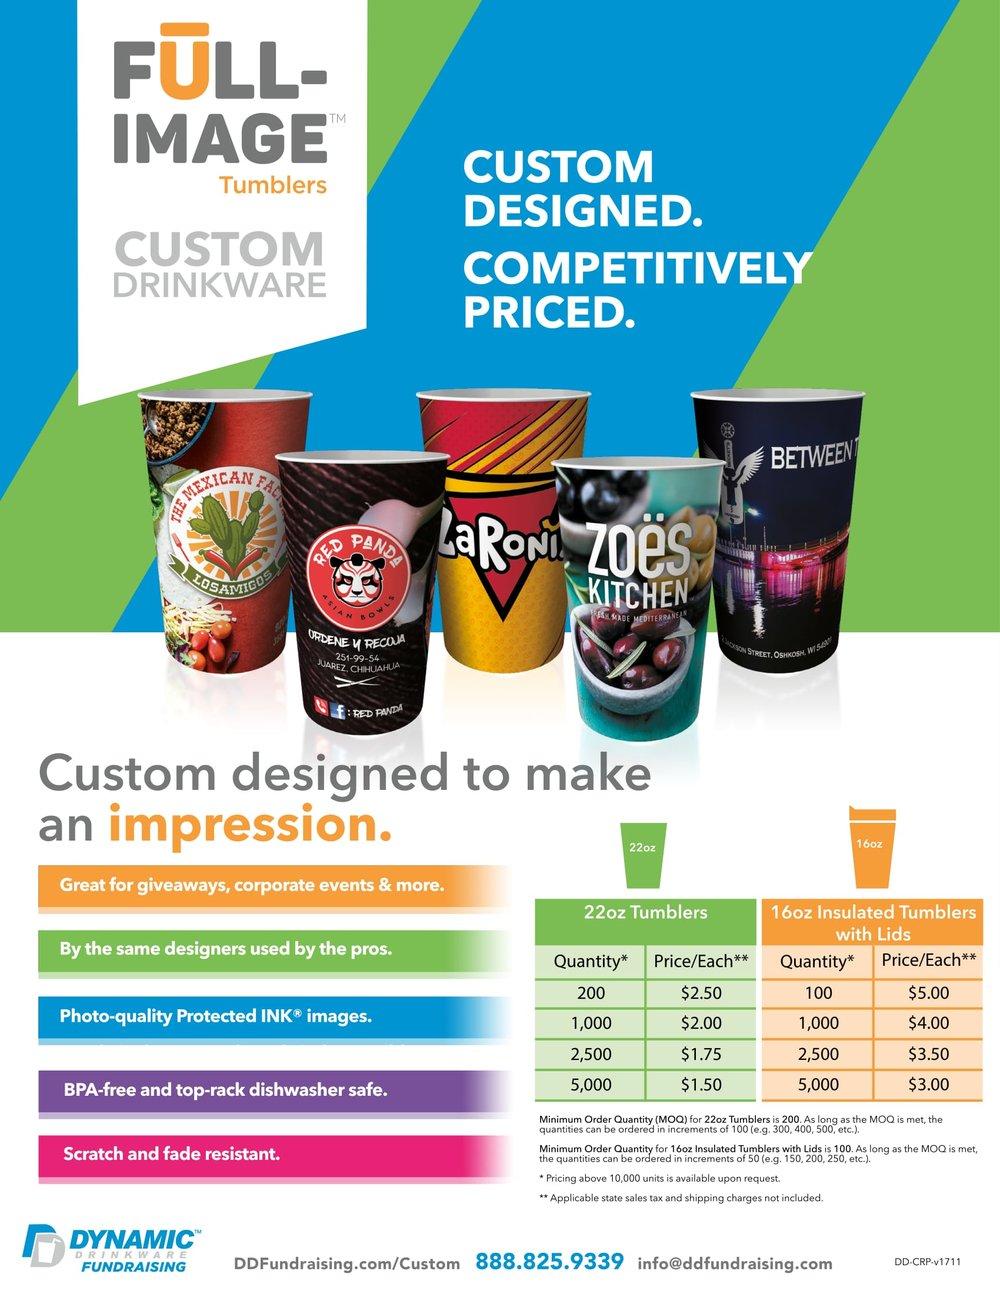 Custom-Drinkware-Restaurants-1.jpg